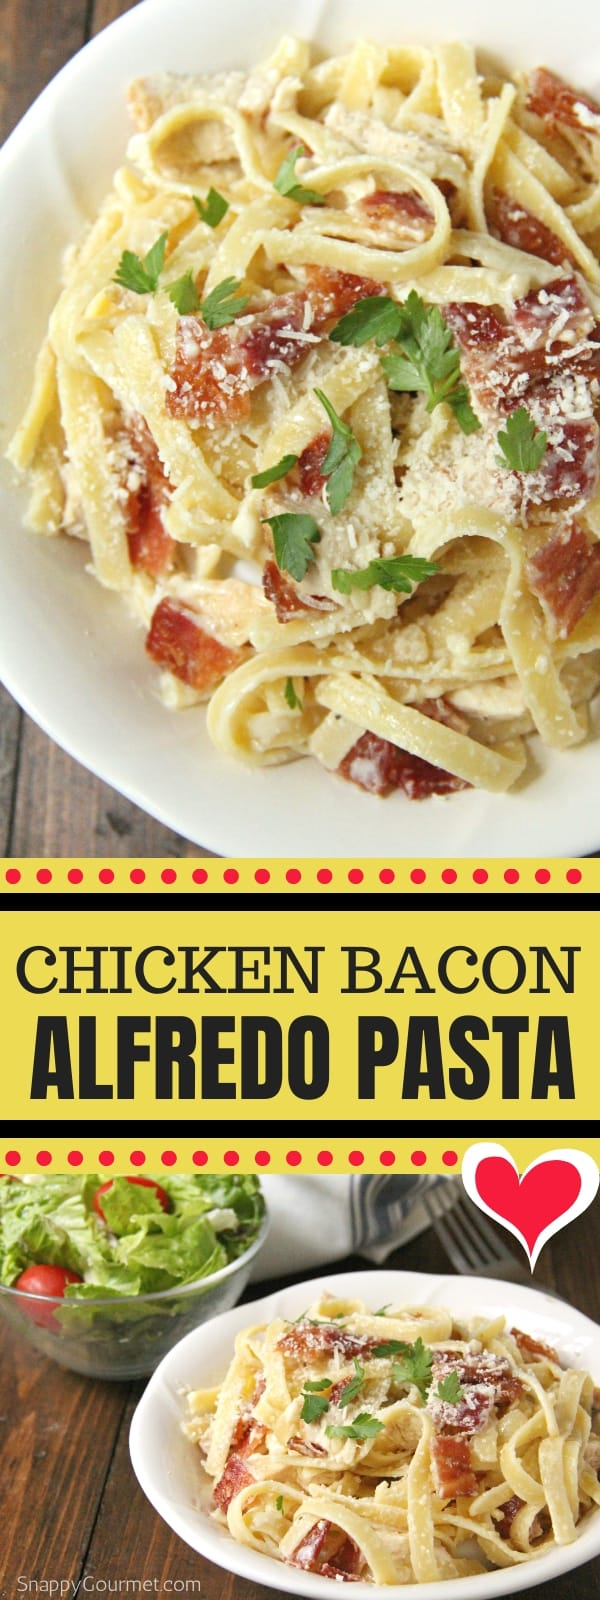 Chicken Bacon Alfredo Pasta collage